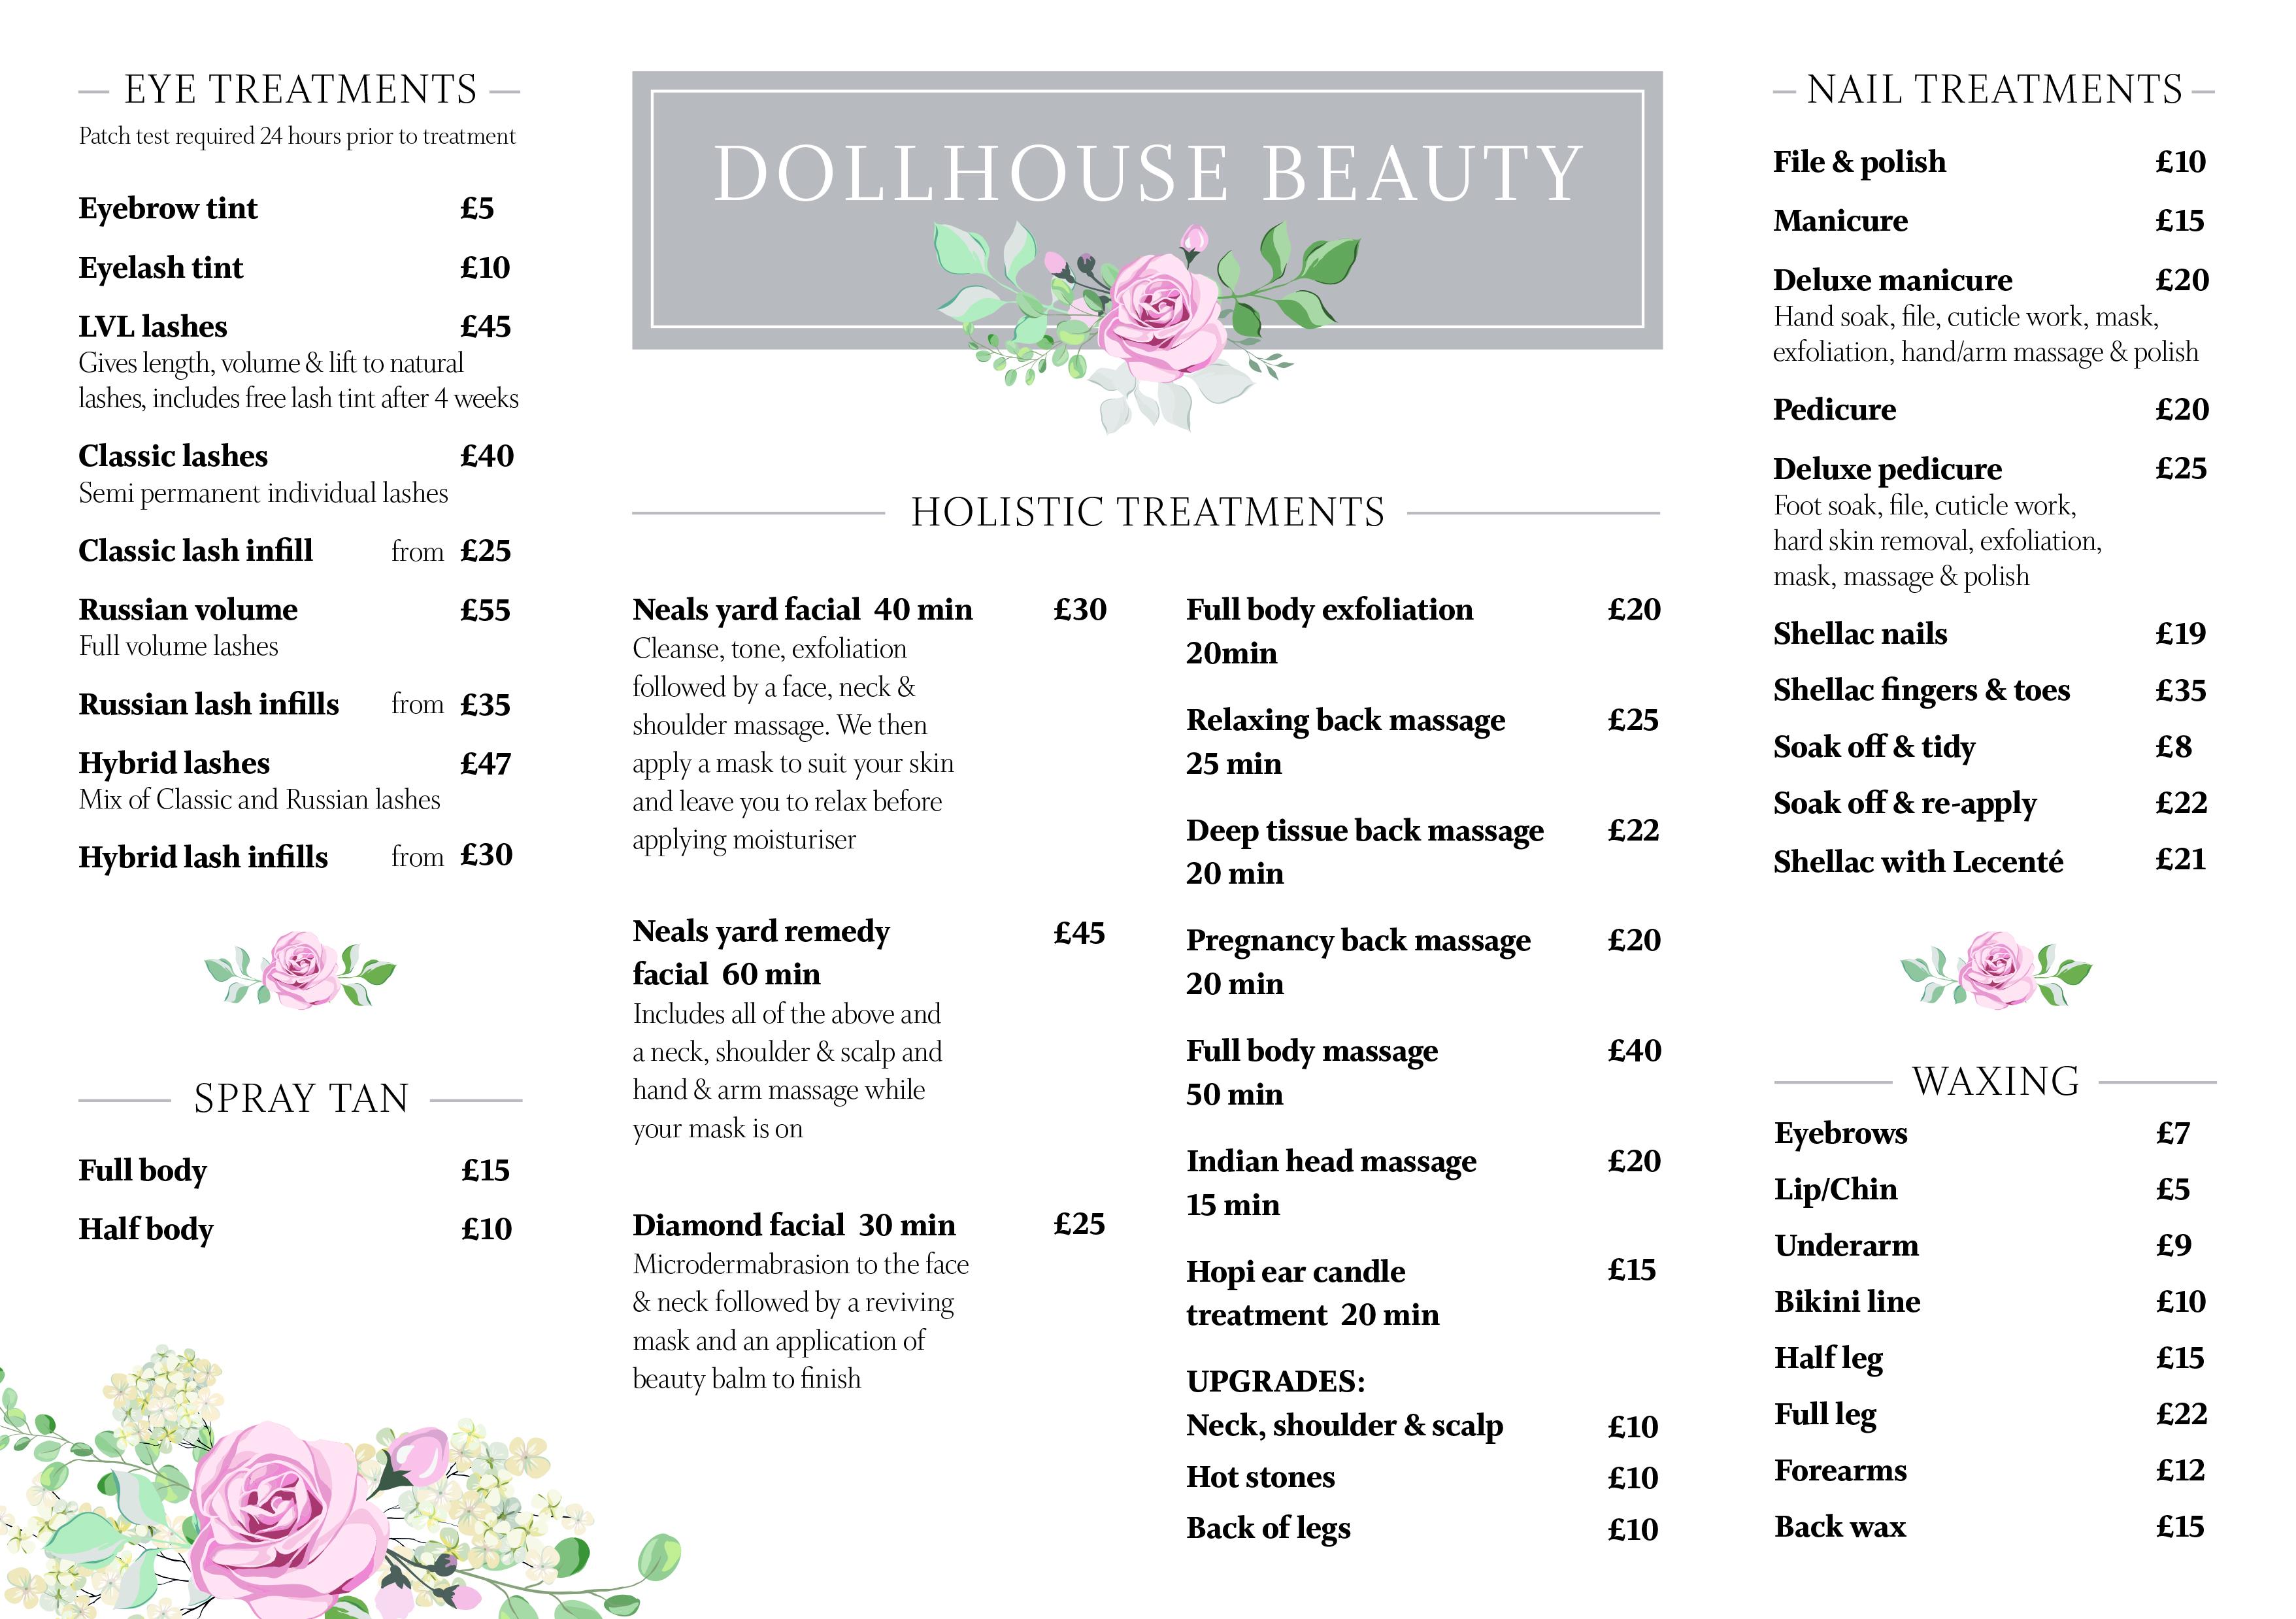 Dollhouse price list